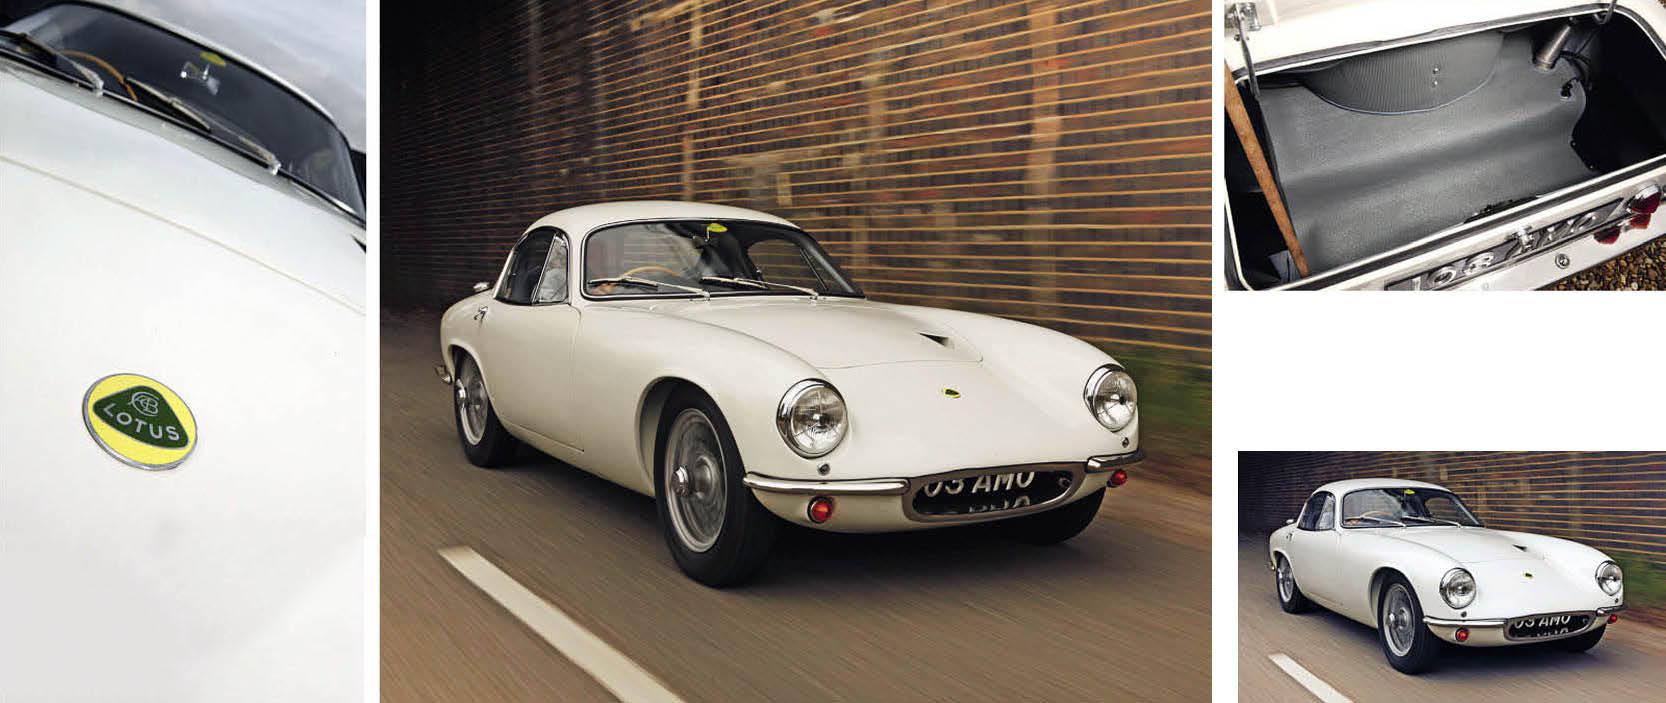 1959 Lotus Elite Type 14 road test